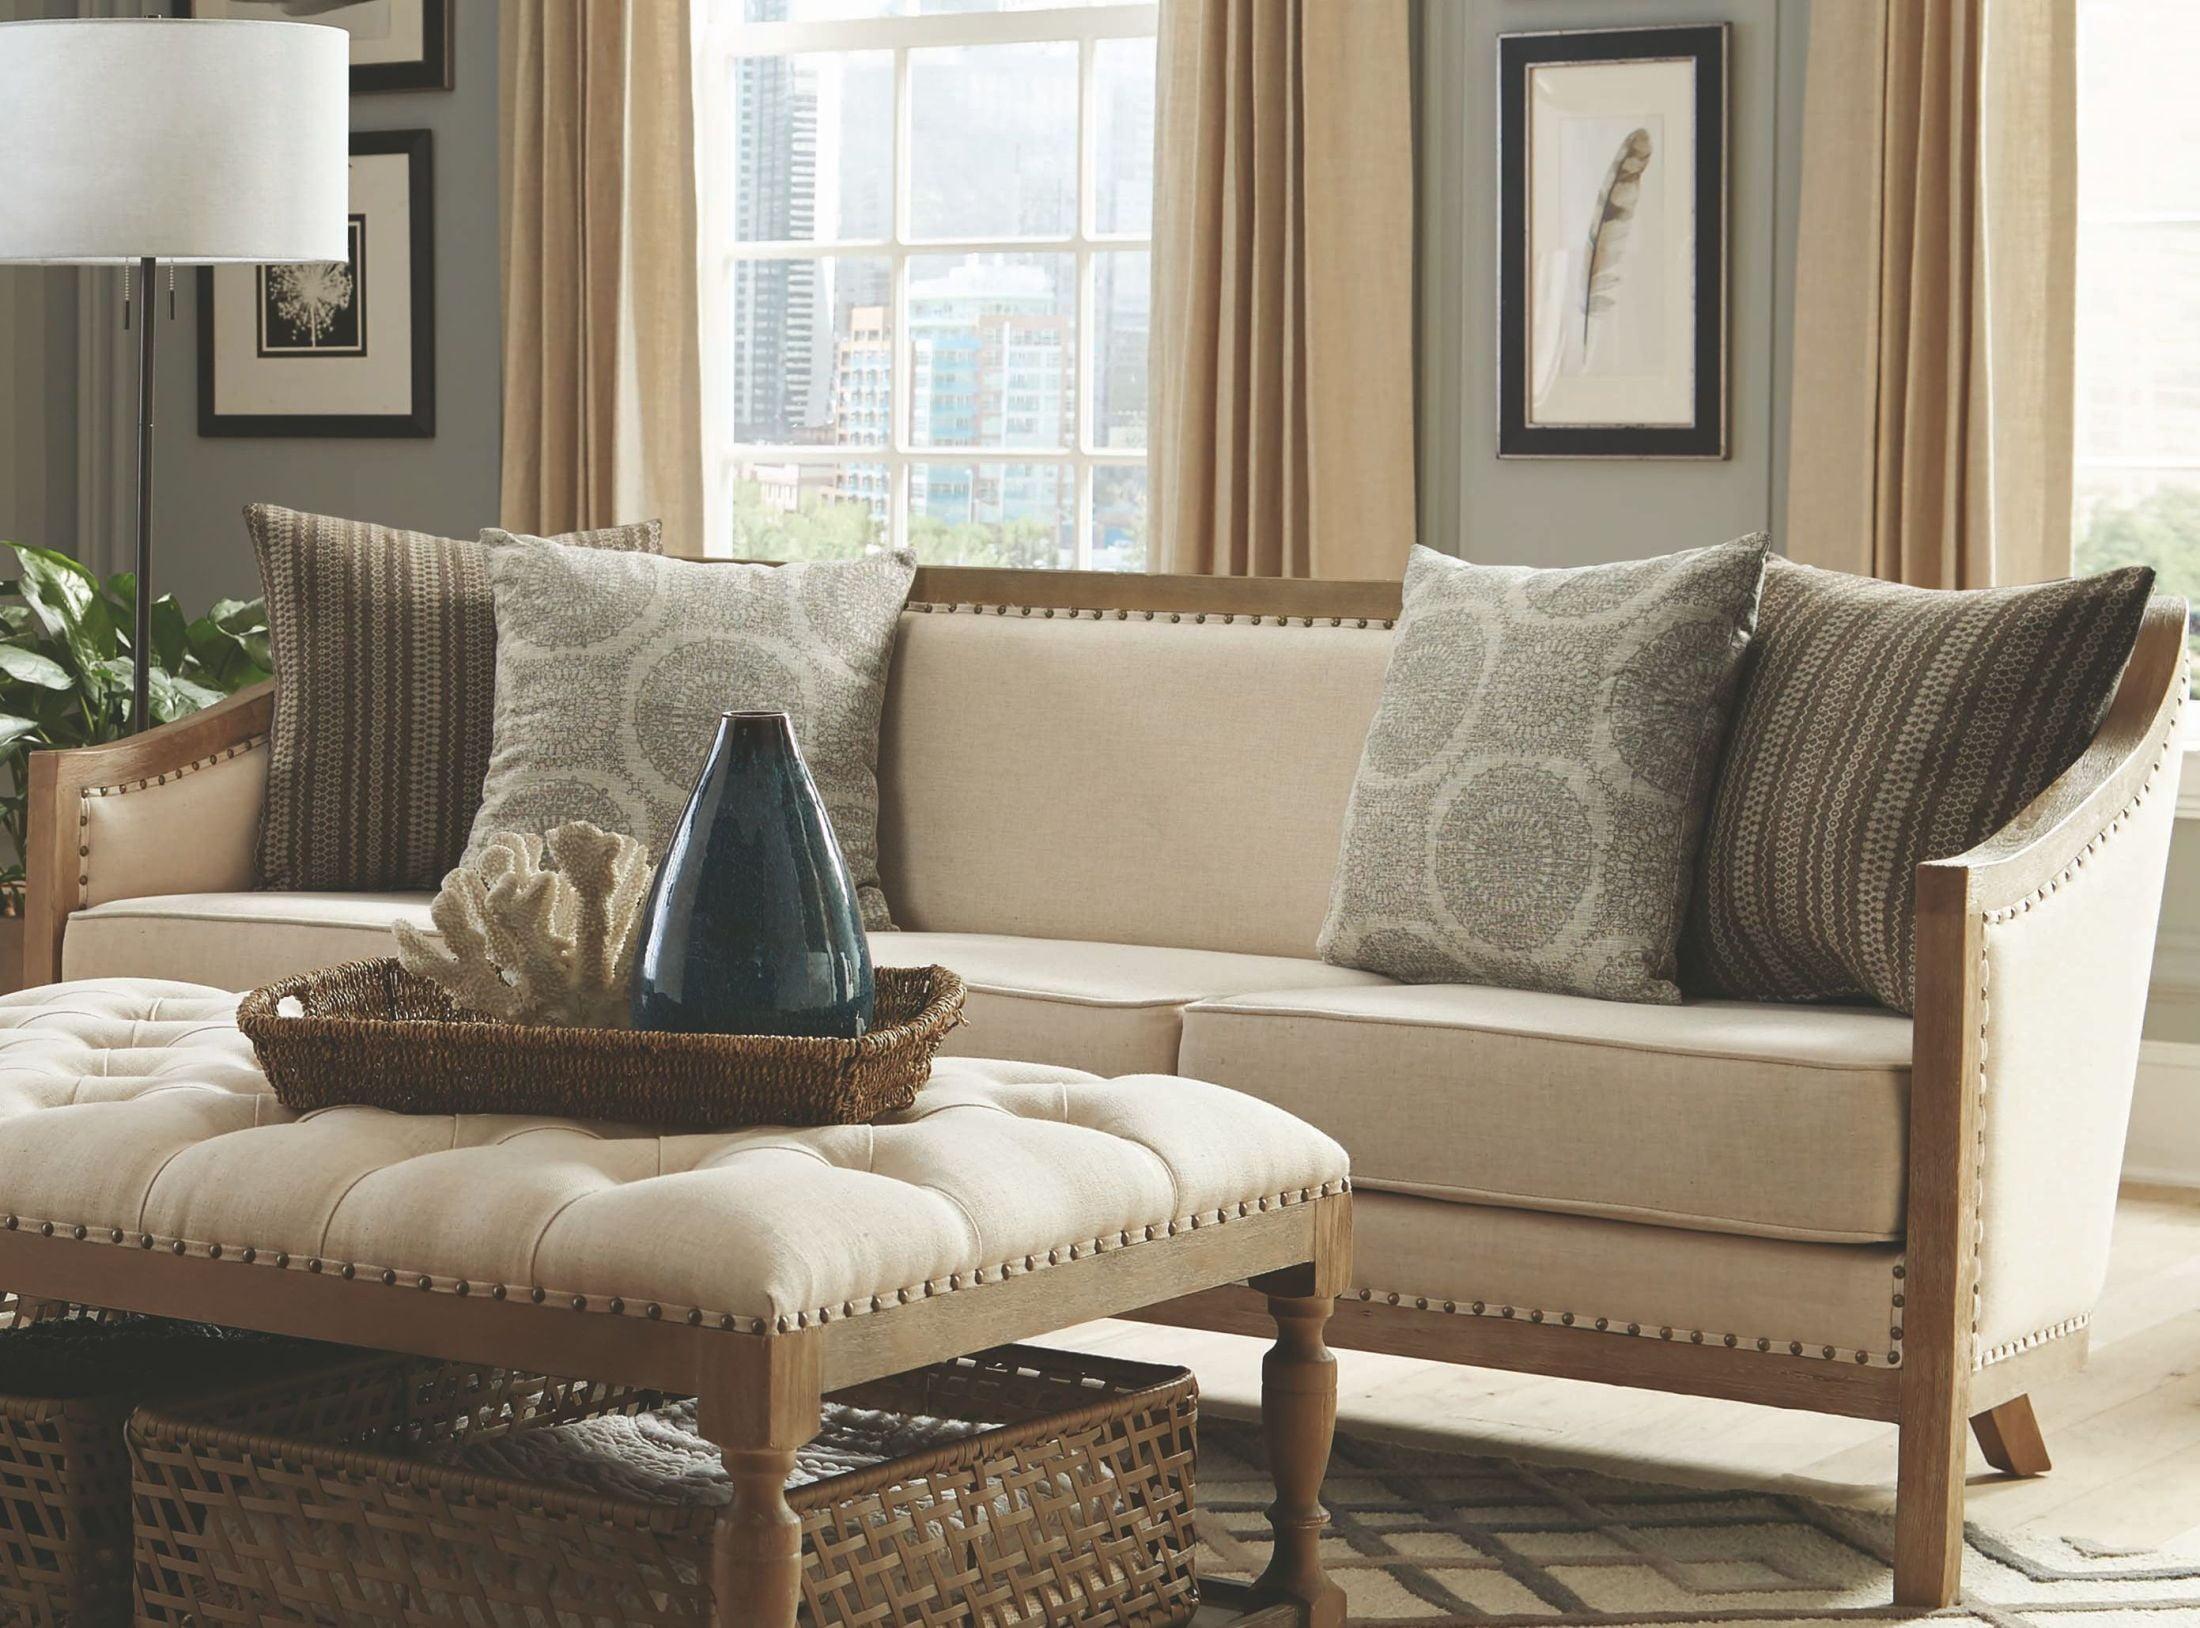 Hamilton natural linen like sofamedia image